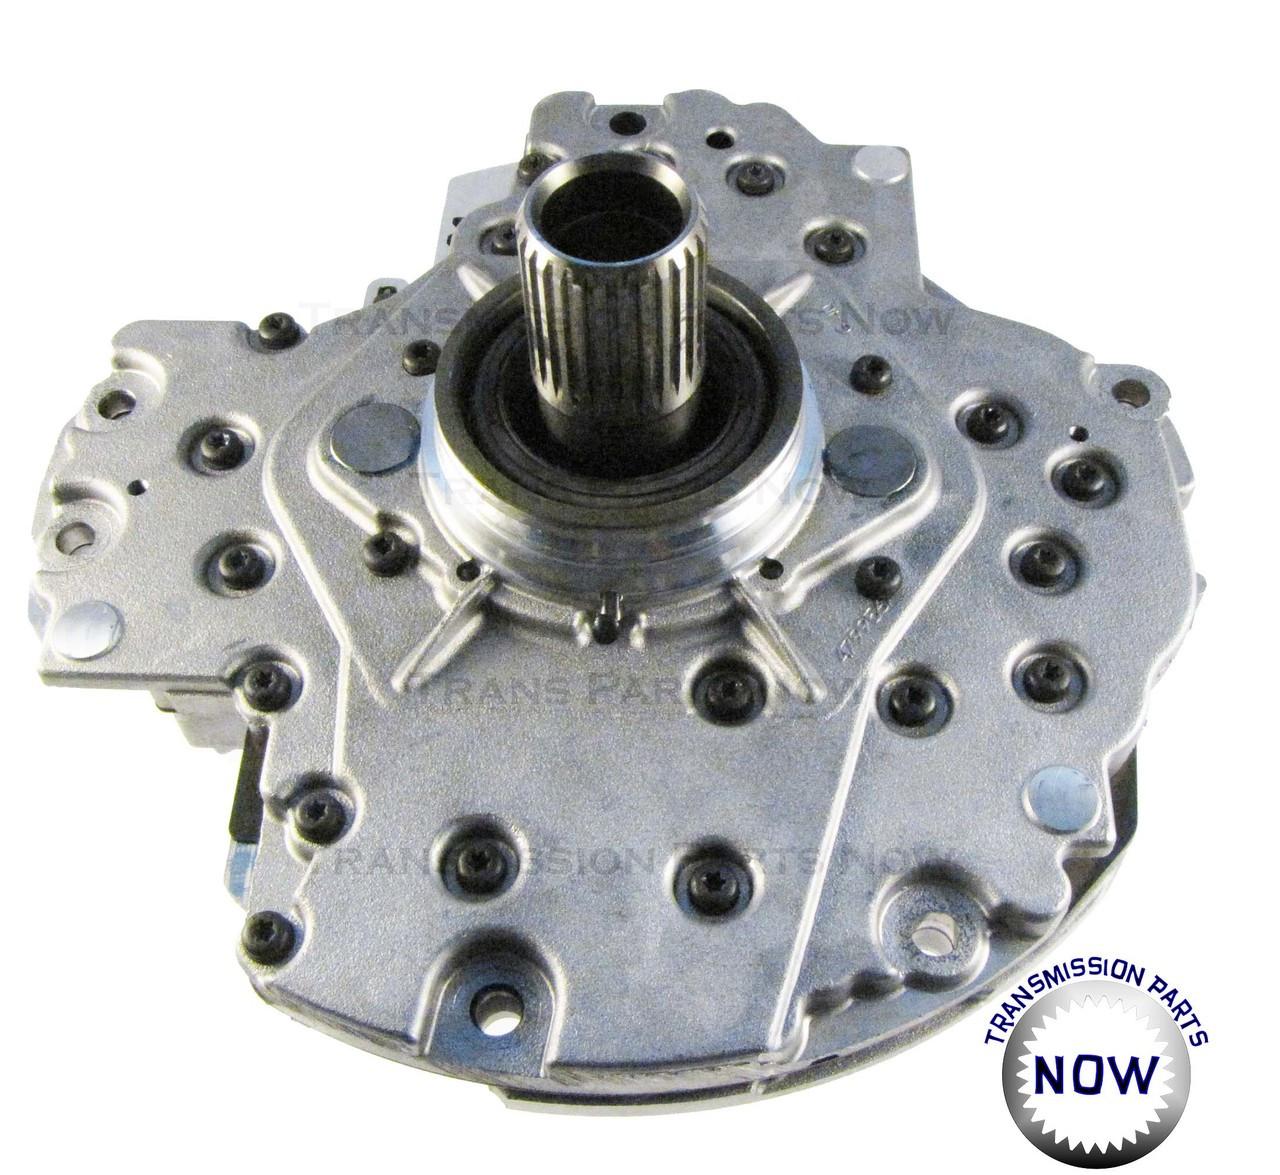 Rebuilt Pump With Sonnax Updates 45RFE / 545RFE 99-07